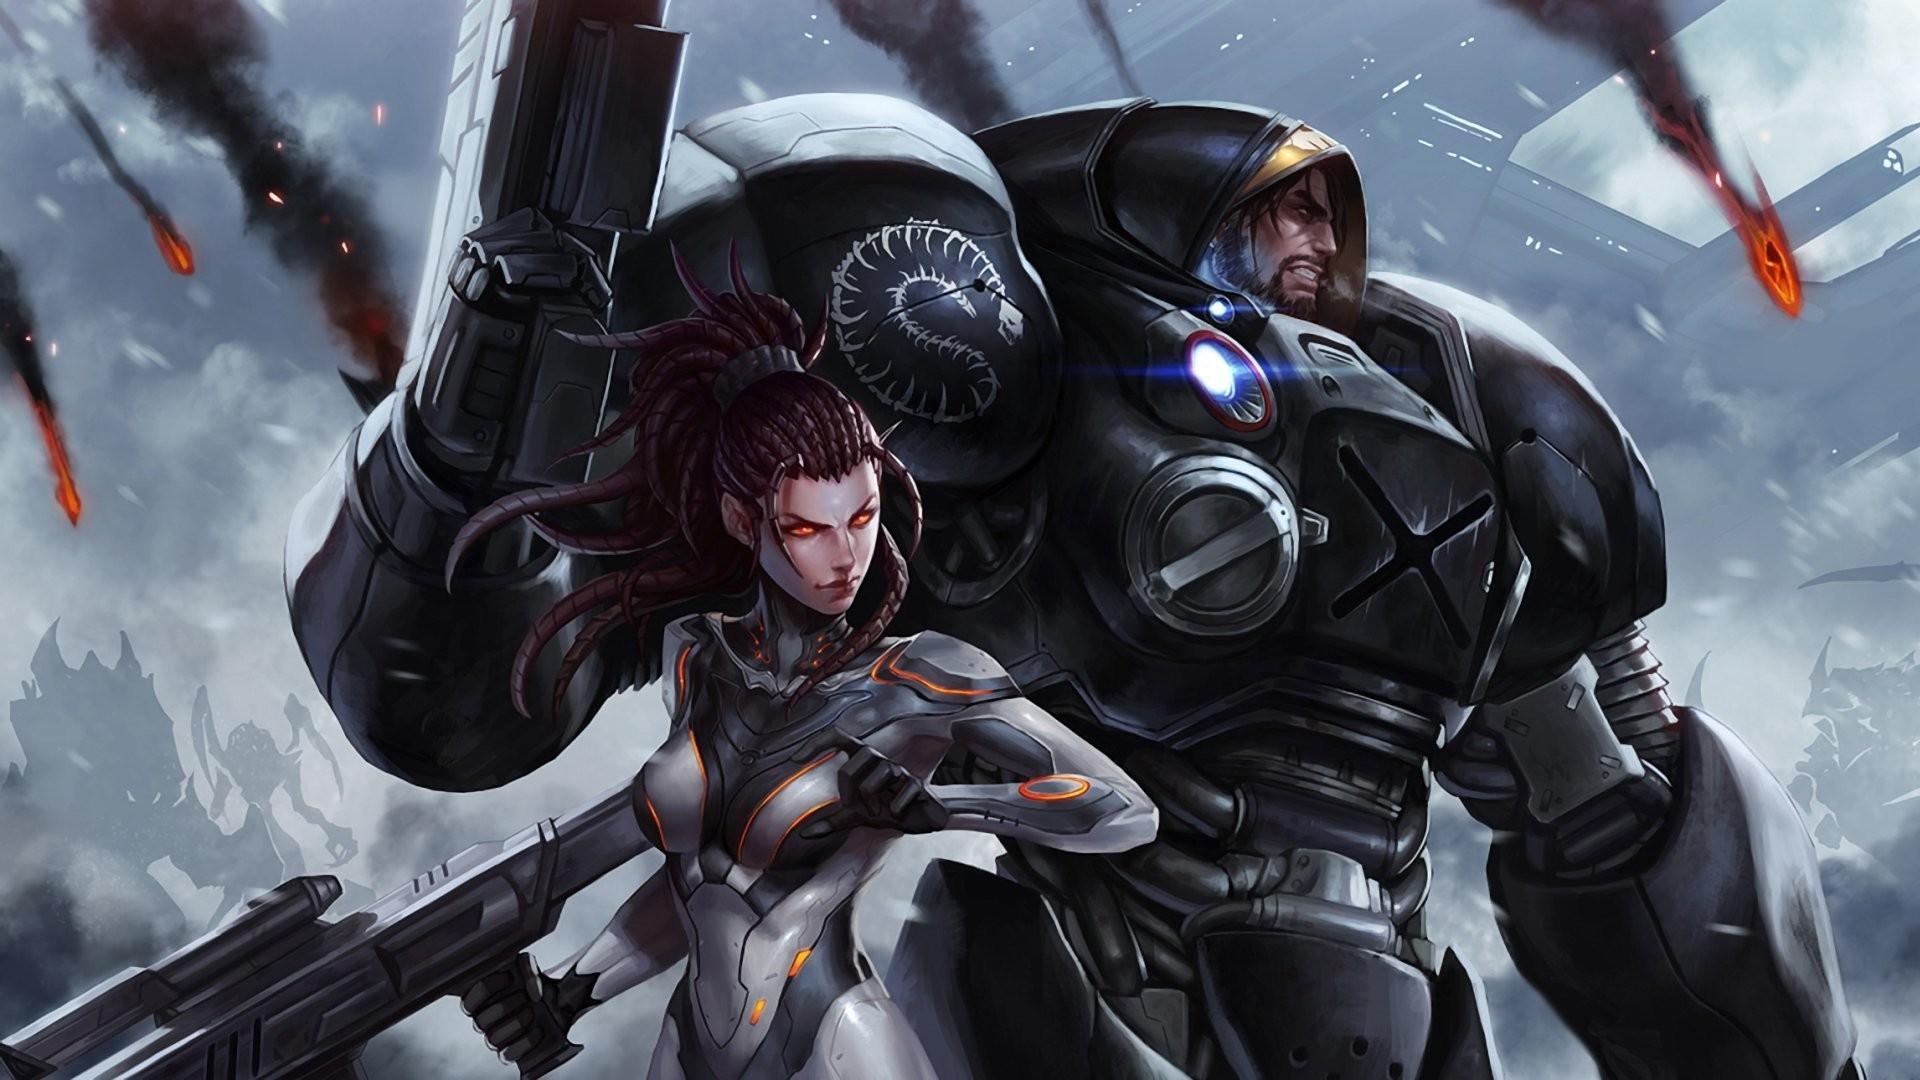 starcraft sarah kerrigan jim raynor landing weapon armour smoke fire  silhouettes